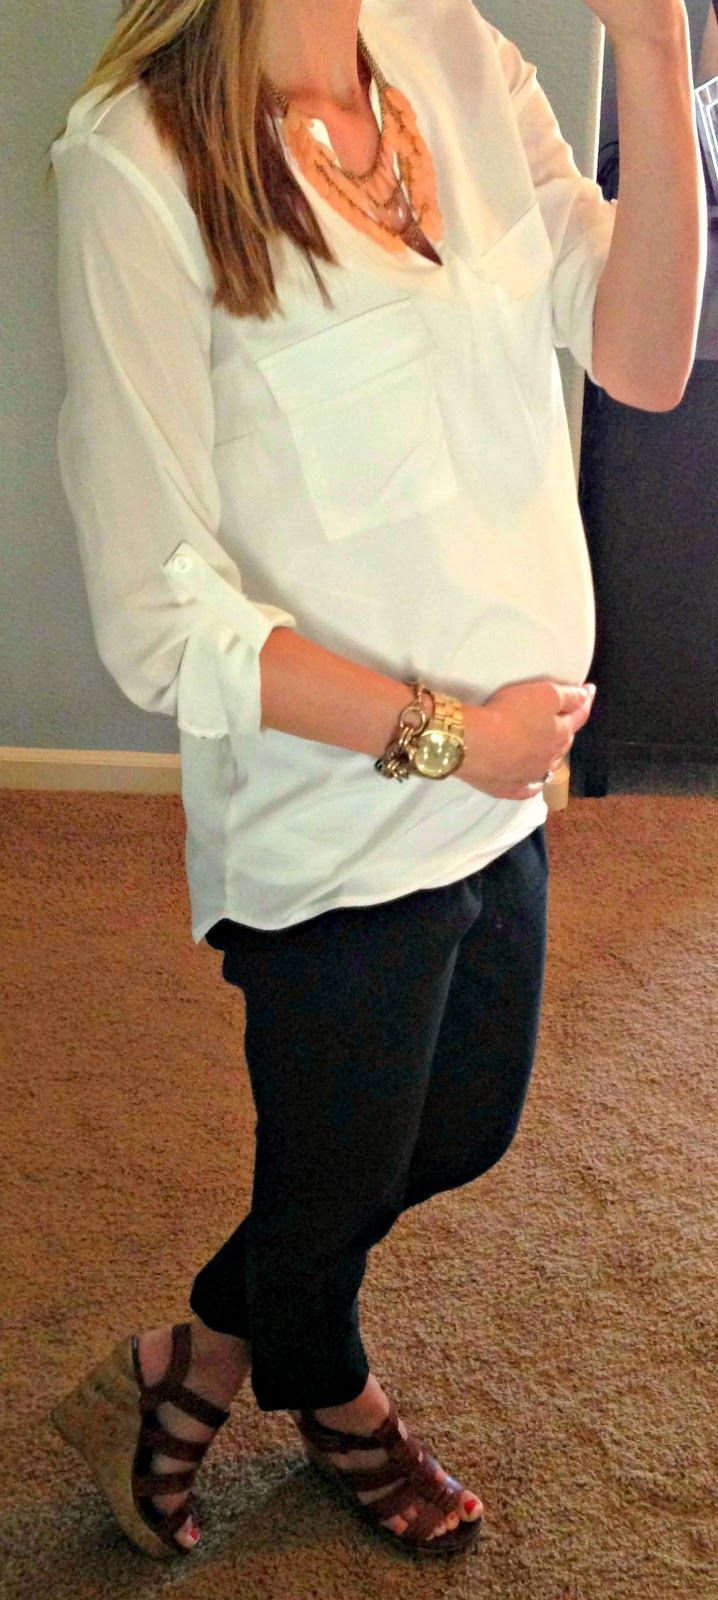 Katie's Closet, maternity fashion, pregnancy style